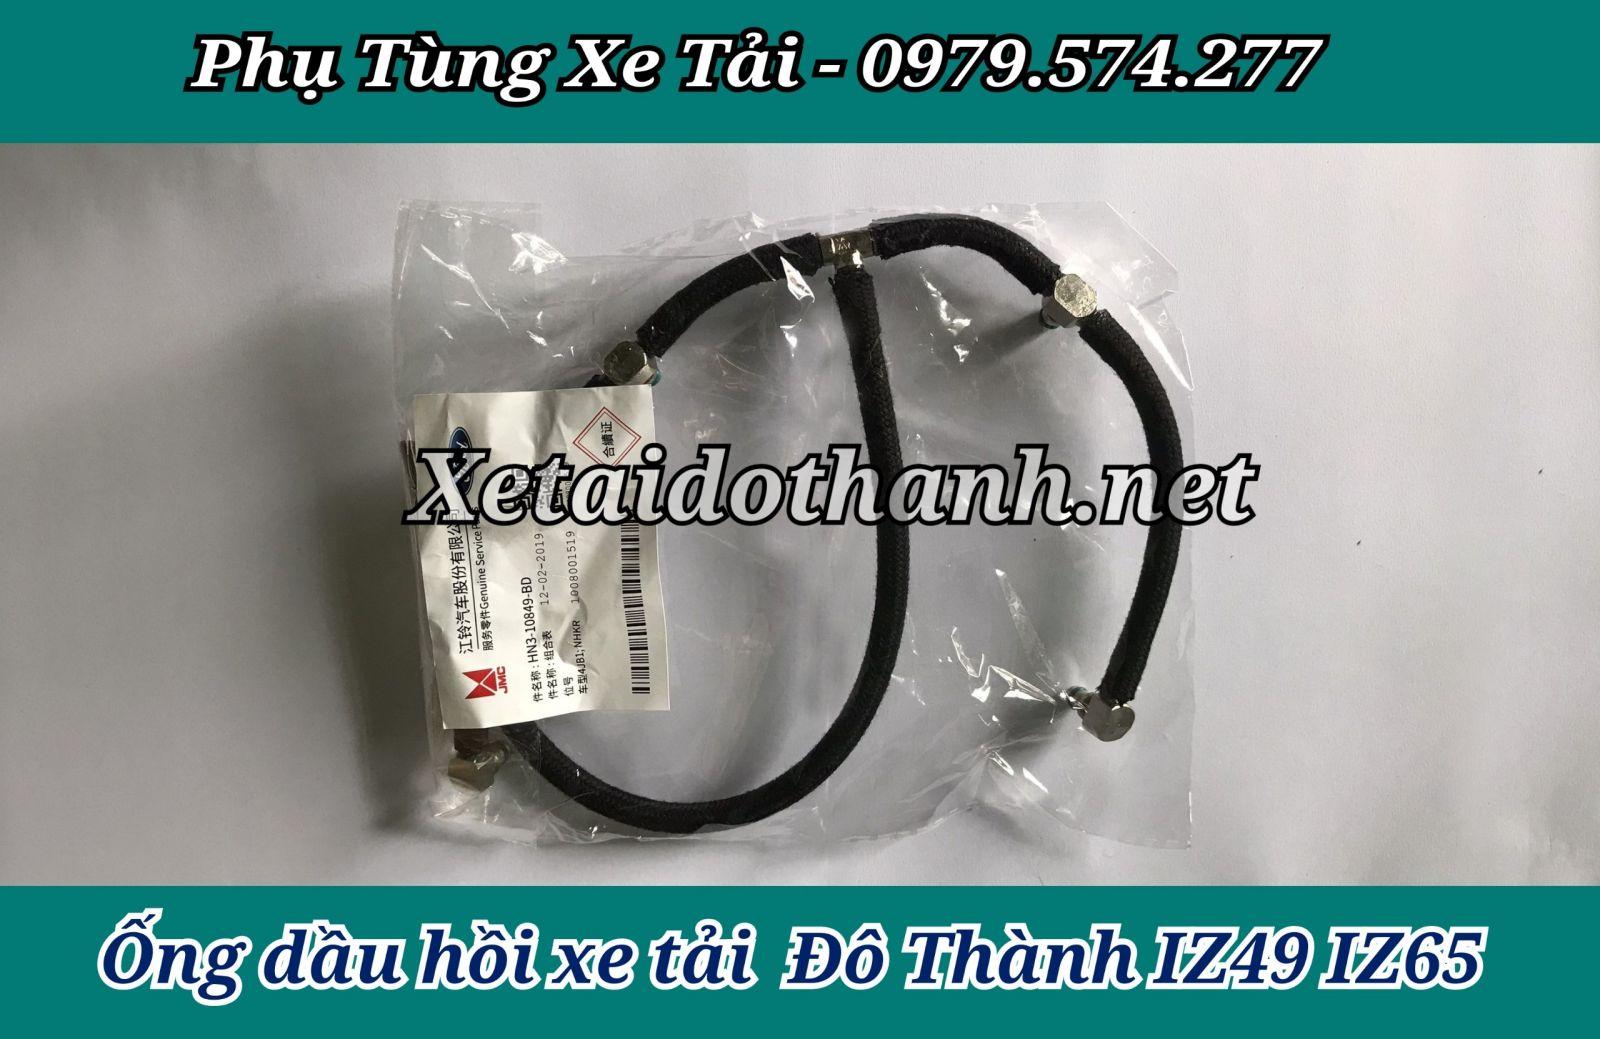 ONG DAU HOI XE IZ49